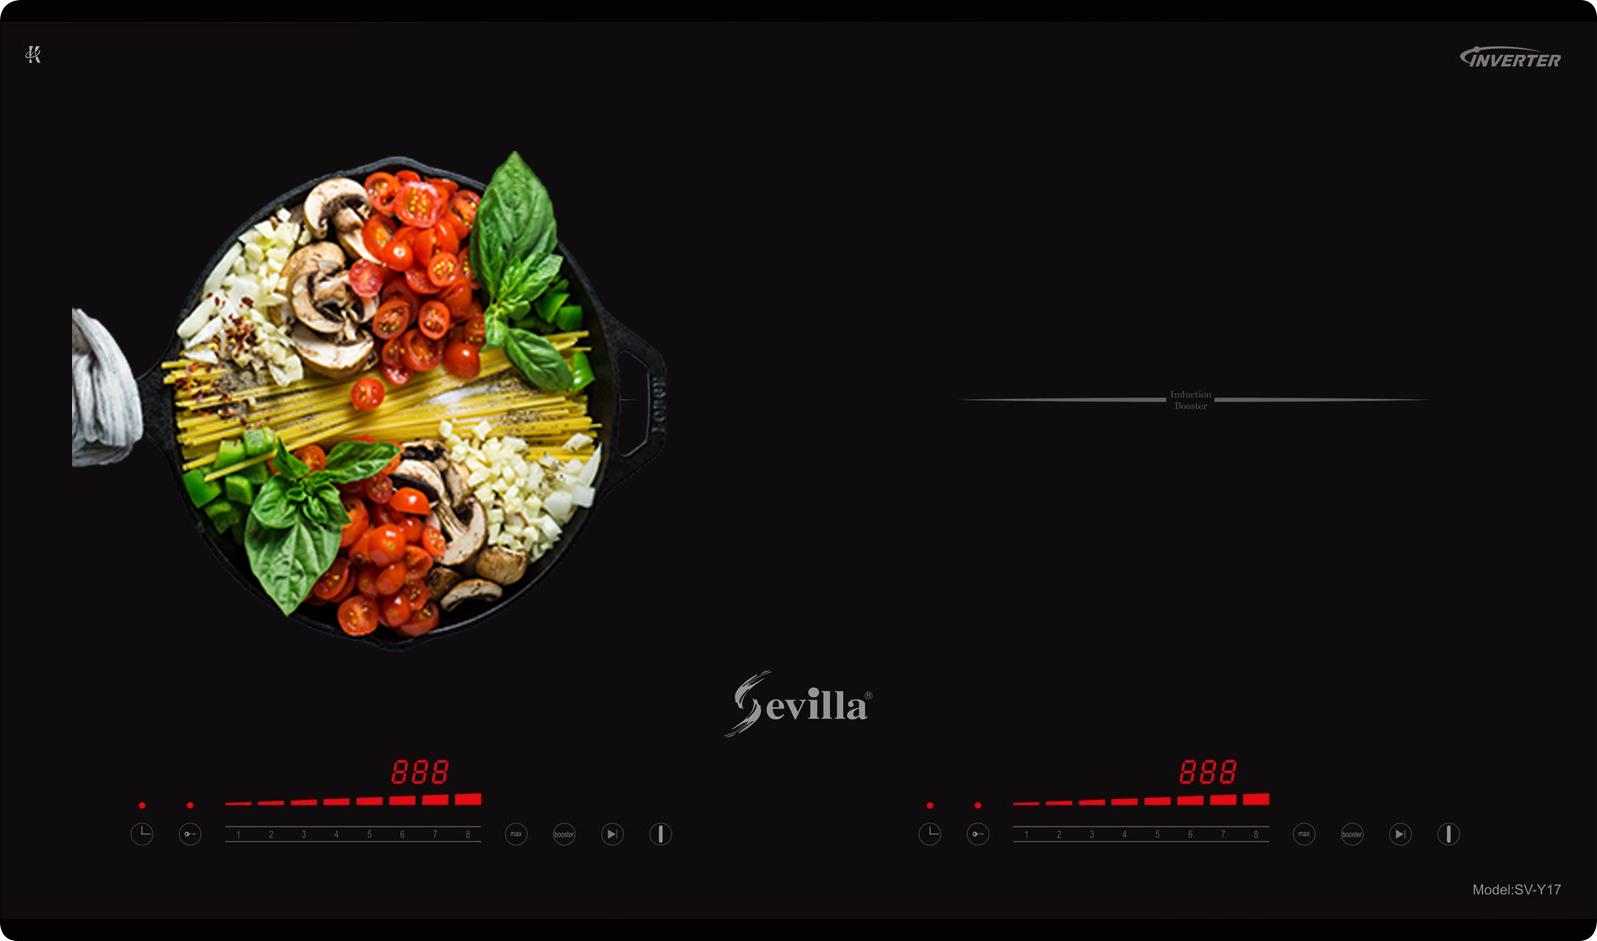 kich-thuoc-bep-tu-sevilla-sv-y17.jpg_product